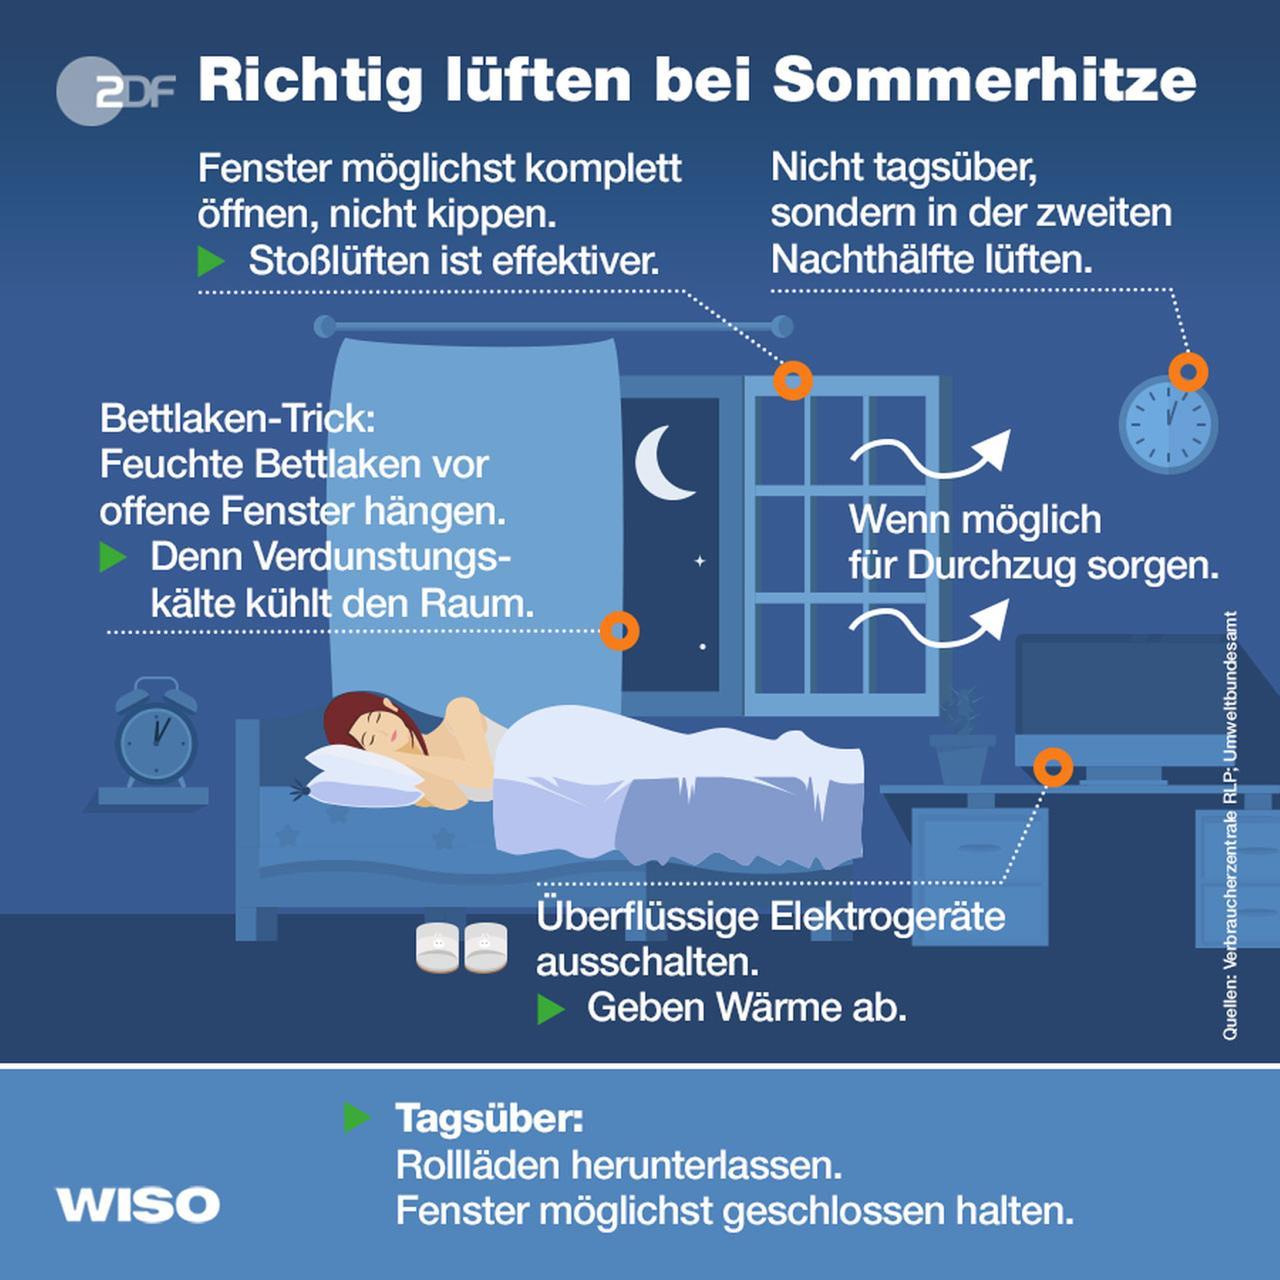 Tipps gegen Sommerhitze im Schlafzimmer - ZDFmediathek